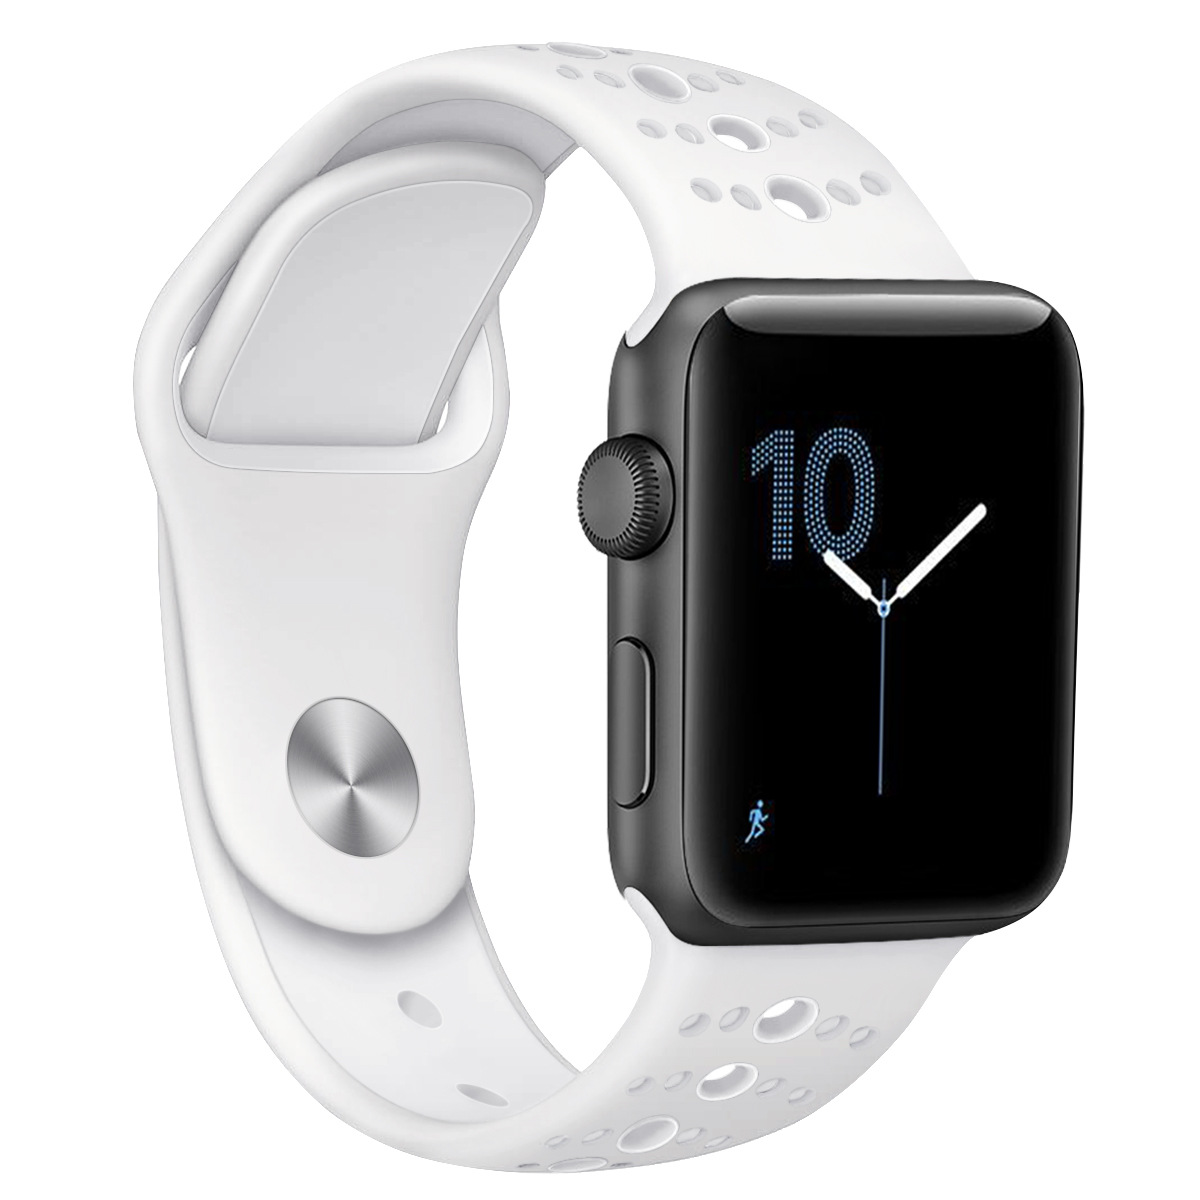 Sport Silicone strap For Apple Watch Band 42mm 38mm Bracelet Watchbands Straps Iwatch Series Wrist Watch Belt все цены